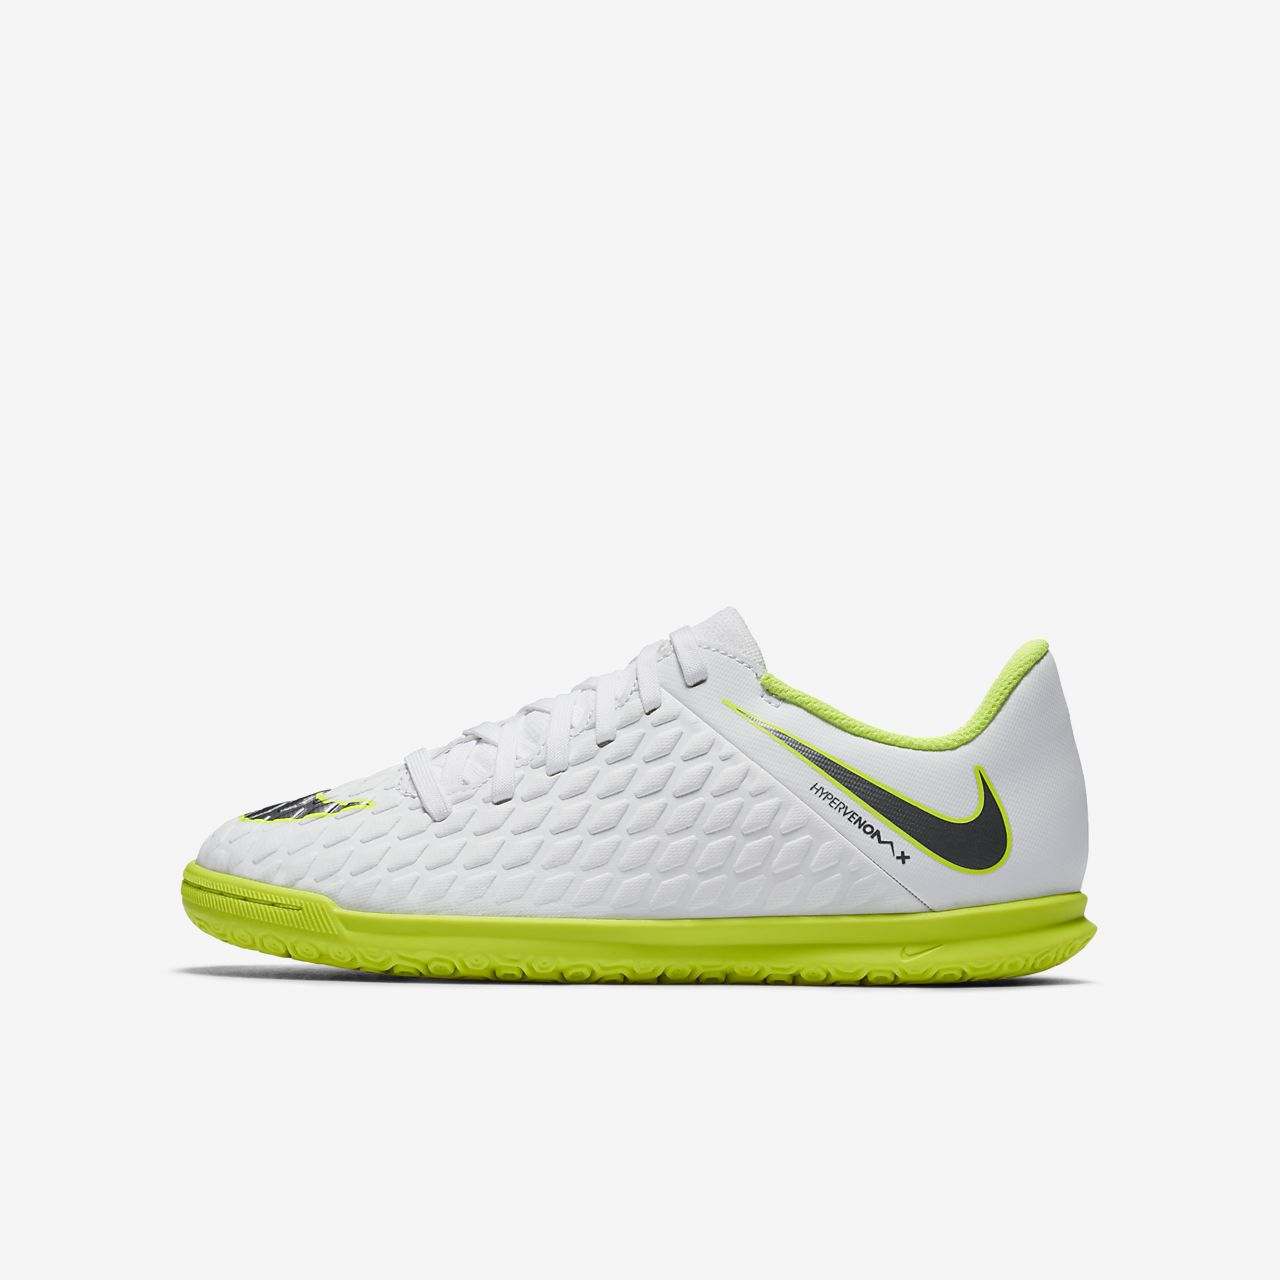 ... Chaussure de football en salle Nike Jr. HypervenomX Phantom III Club IC  pour Jeune enfant